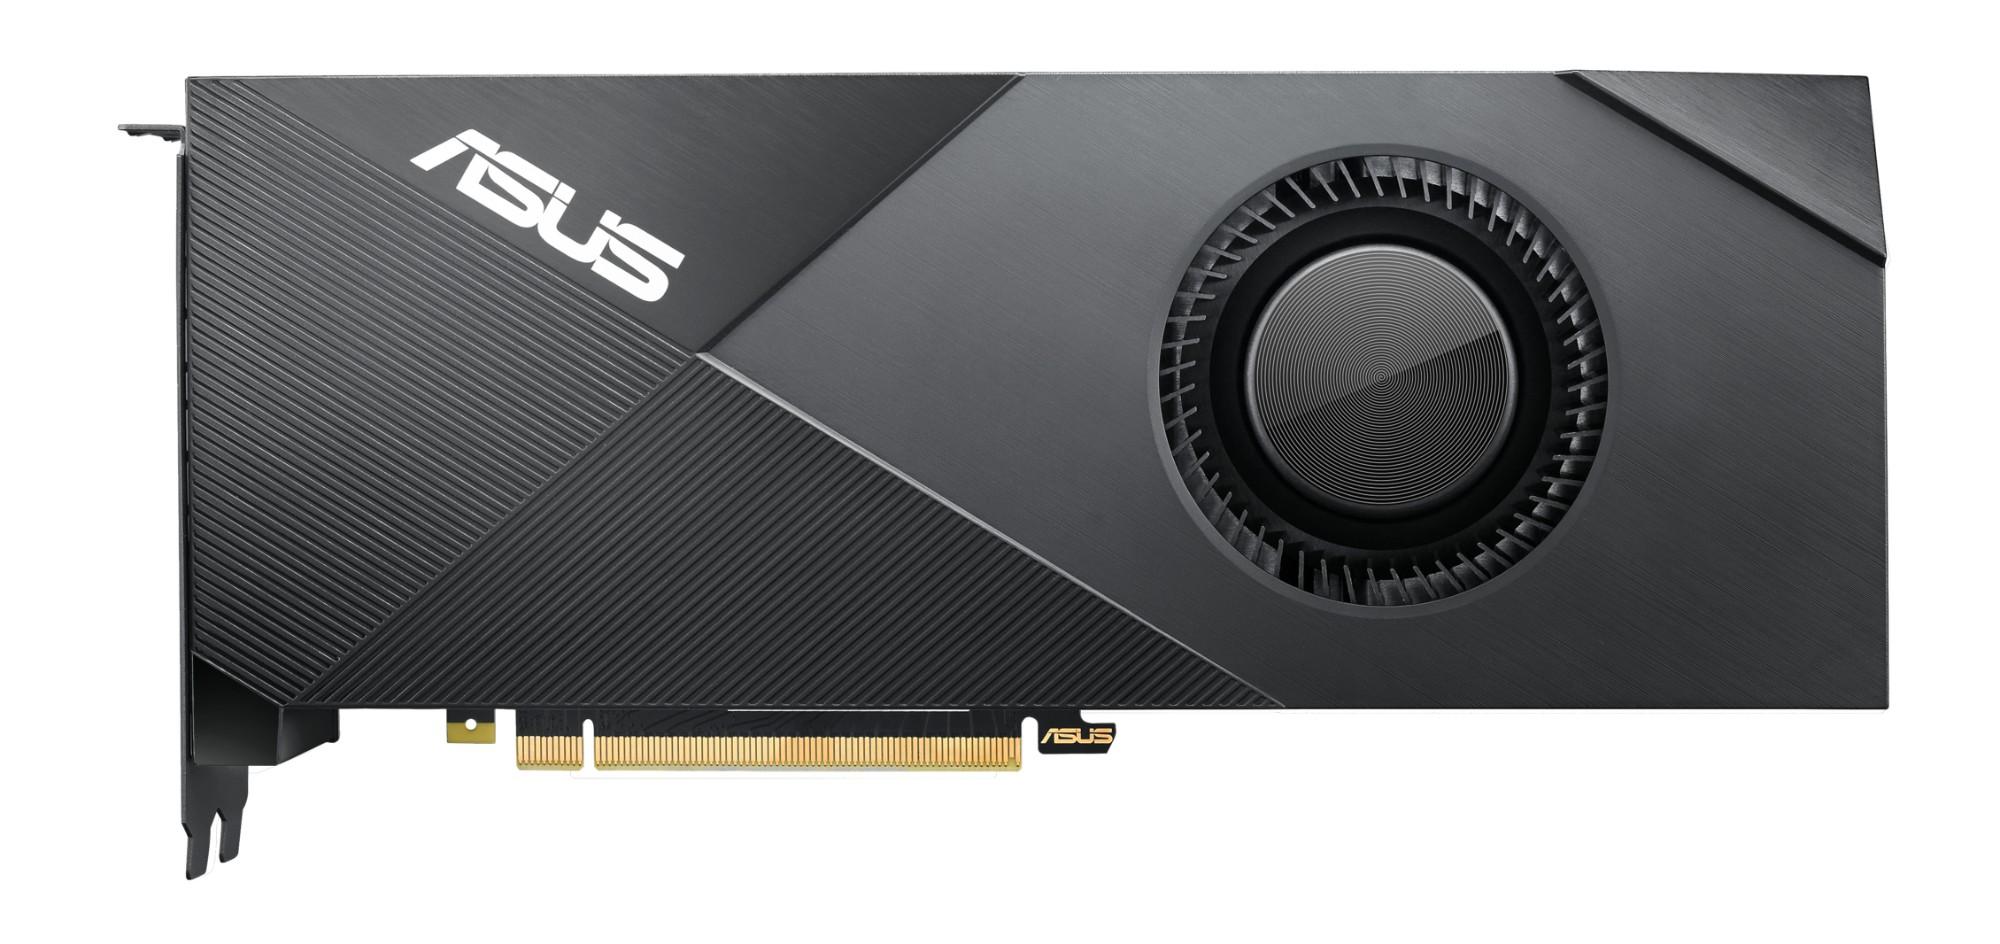 ASUS TURBO-RTX2080-8G GeForce RTX 2080 8 GB GDDR6